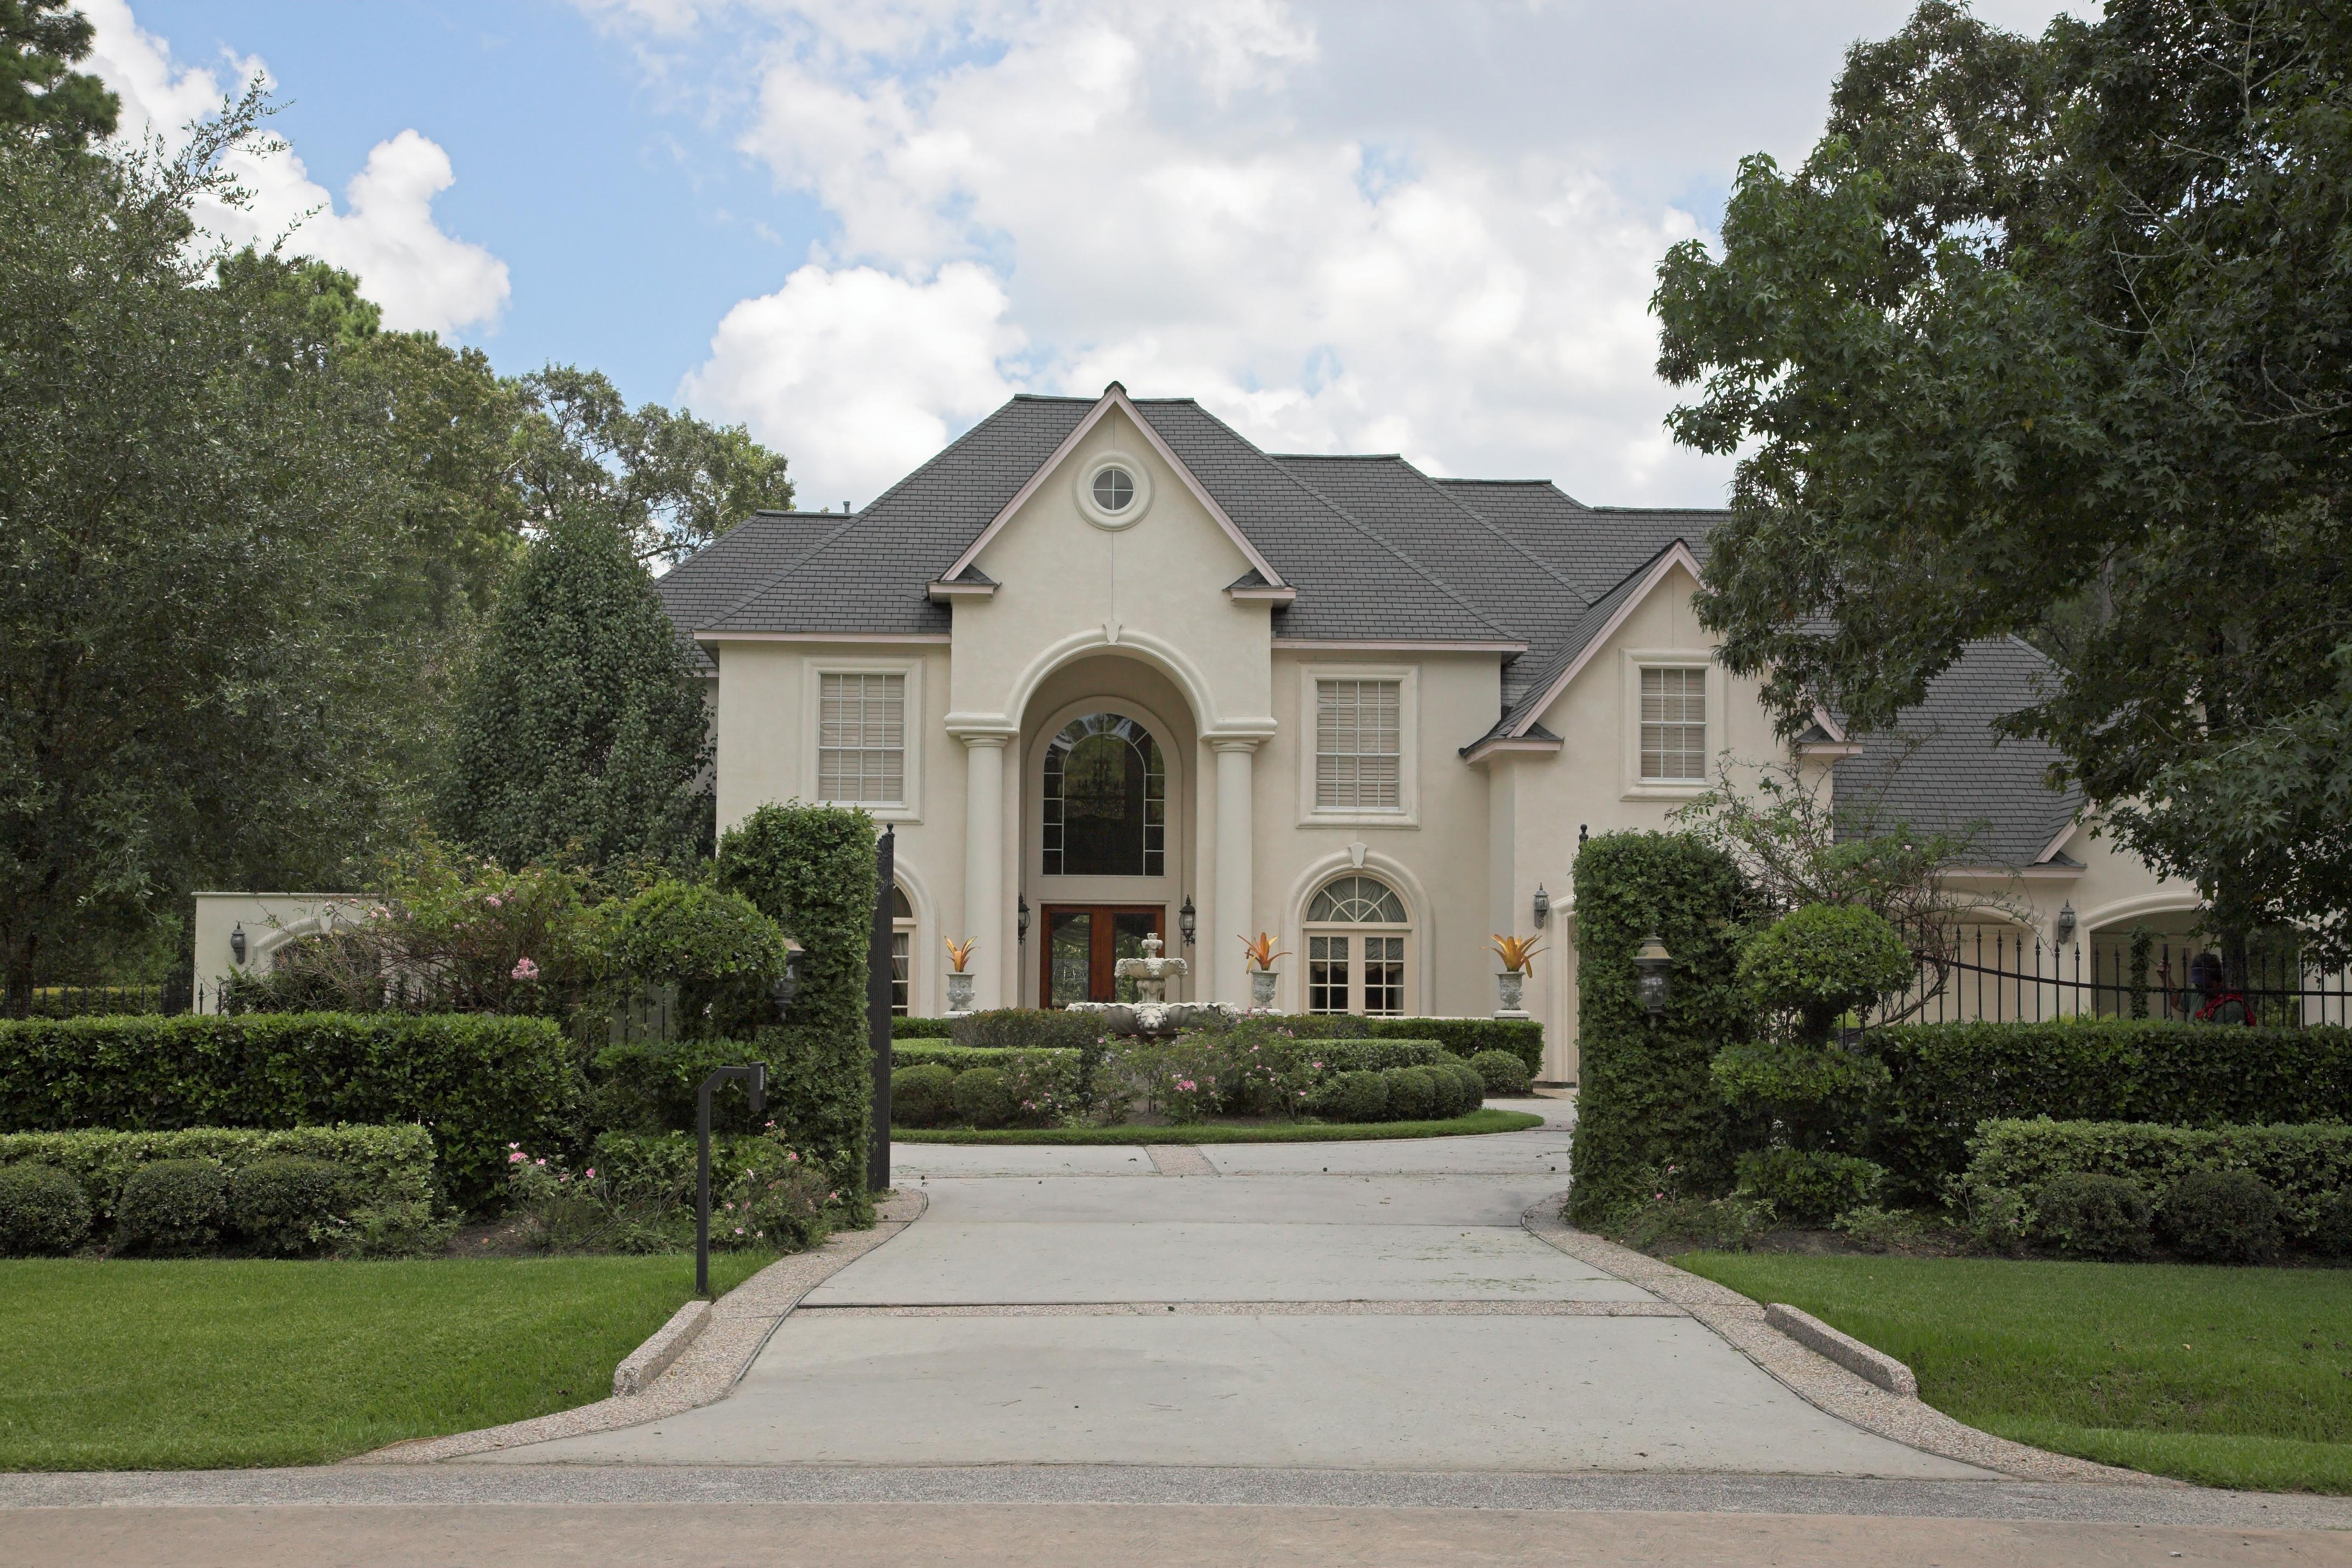 bigstock-Million-Dollar-Homes-Series-1927768